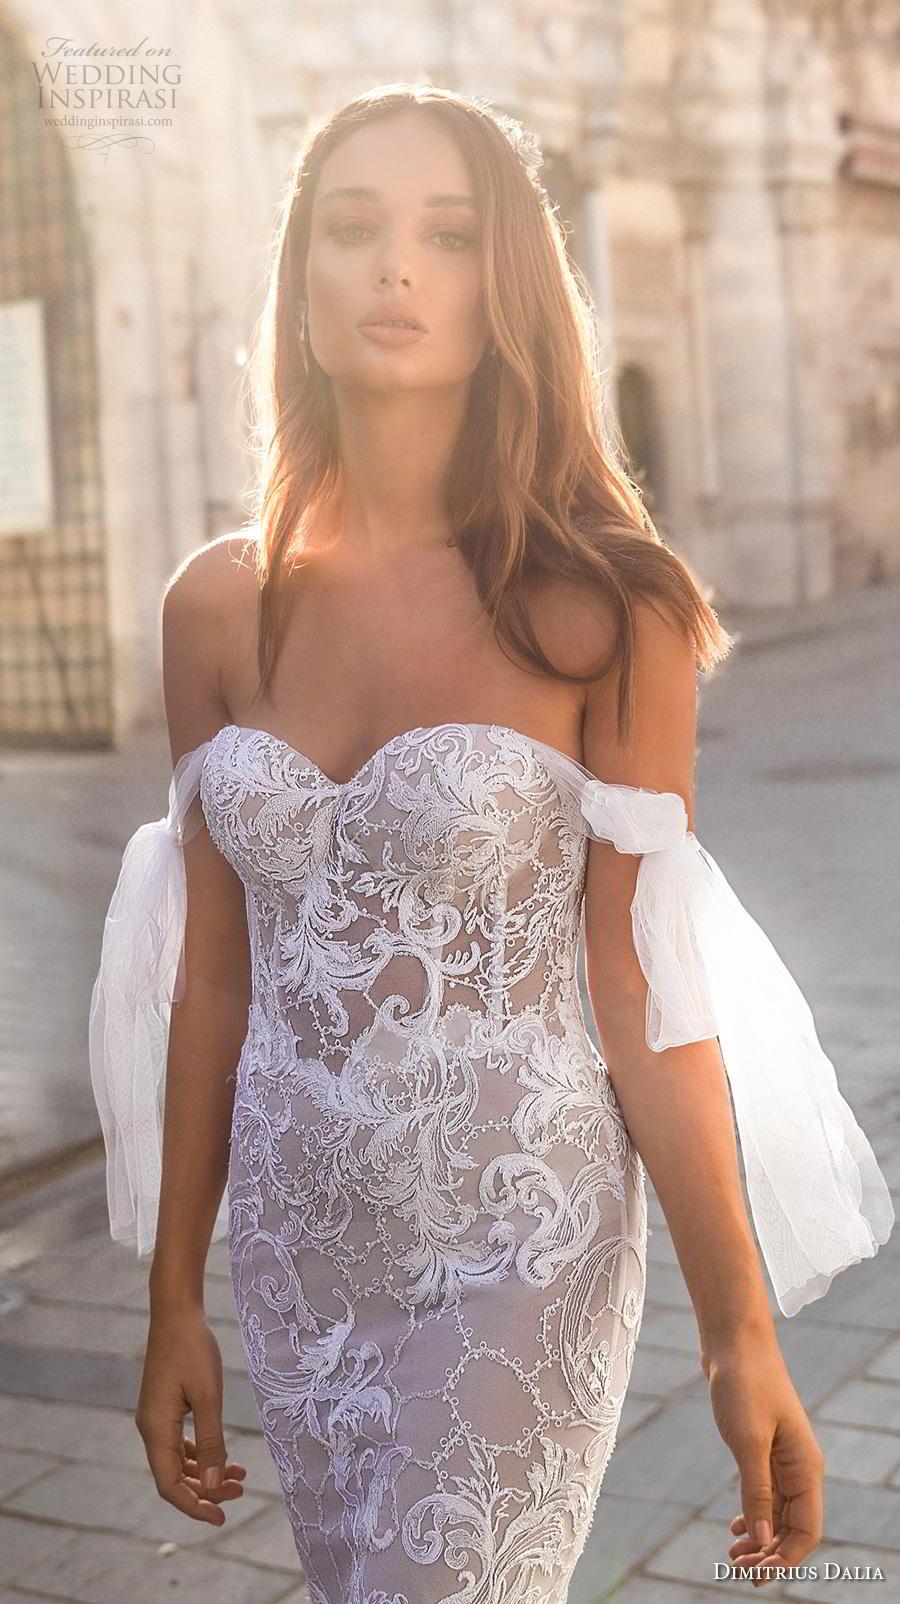 dimitrius dalia 2019 bridal off the shoulder sweetheart neckline full embellishment bustier elegant fit and flare wedding dress  mid back medium train (3) zv